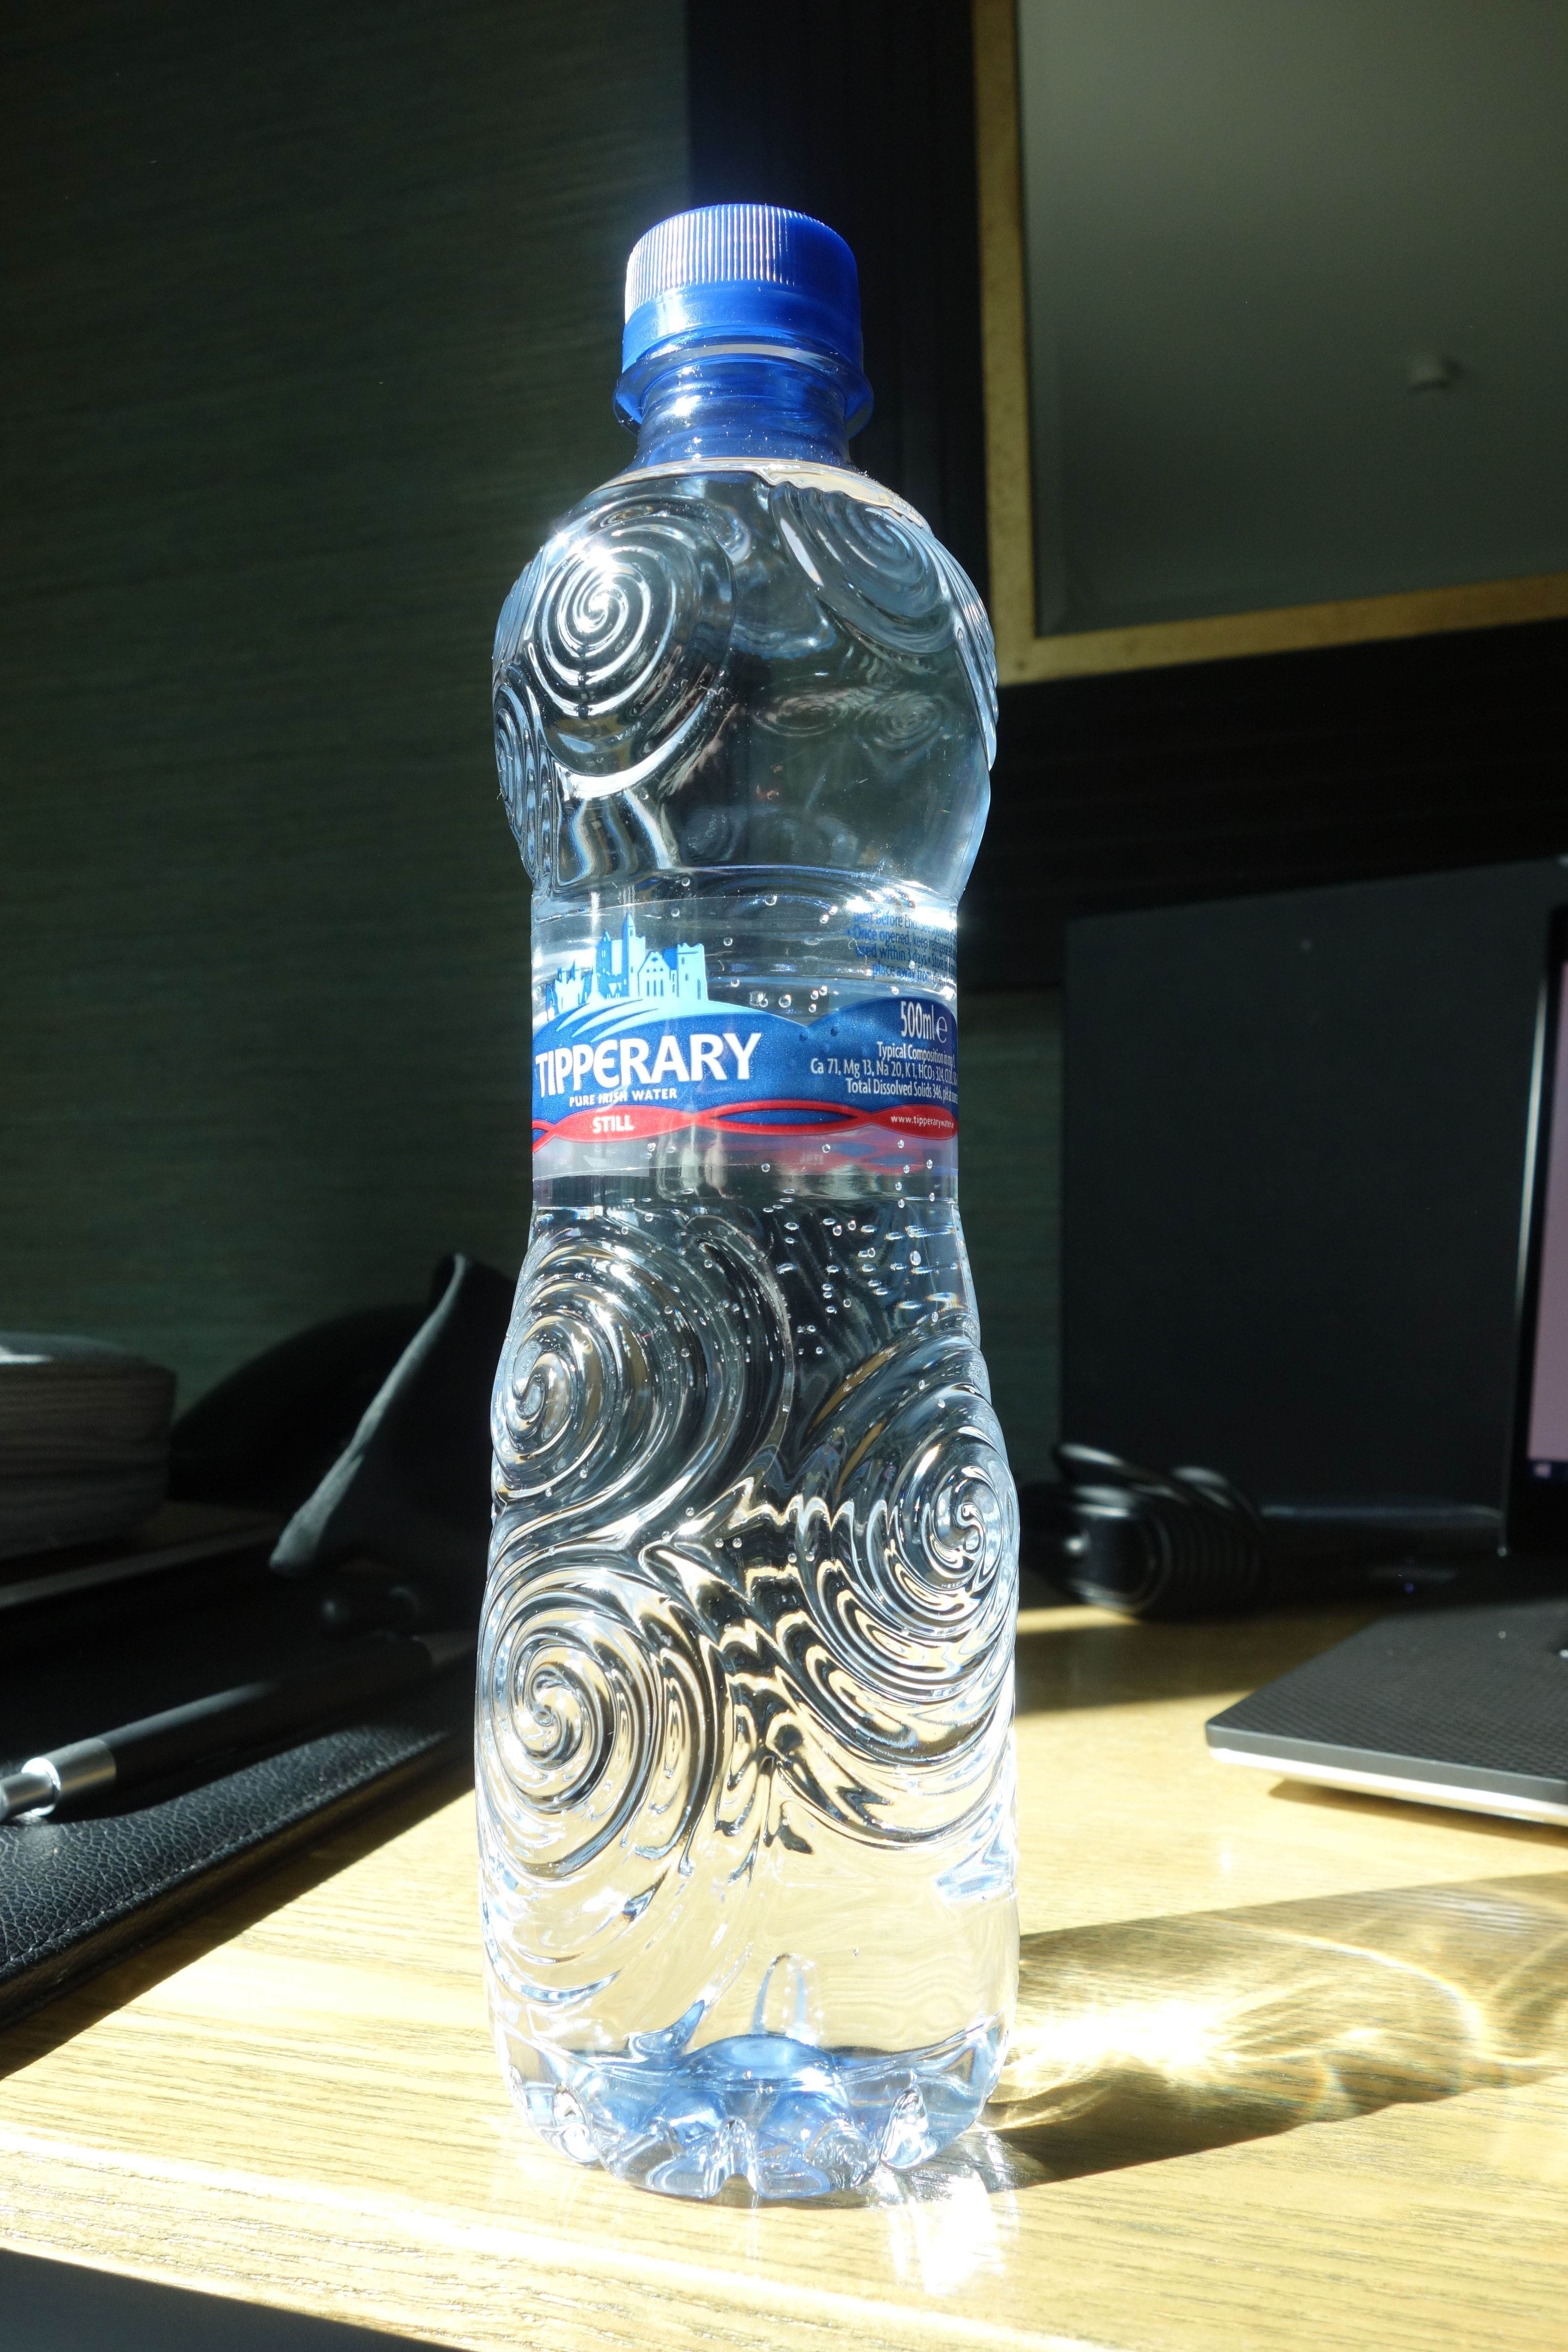 Figure 2. New Grange symbol on bottle